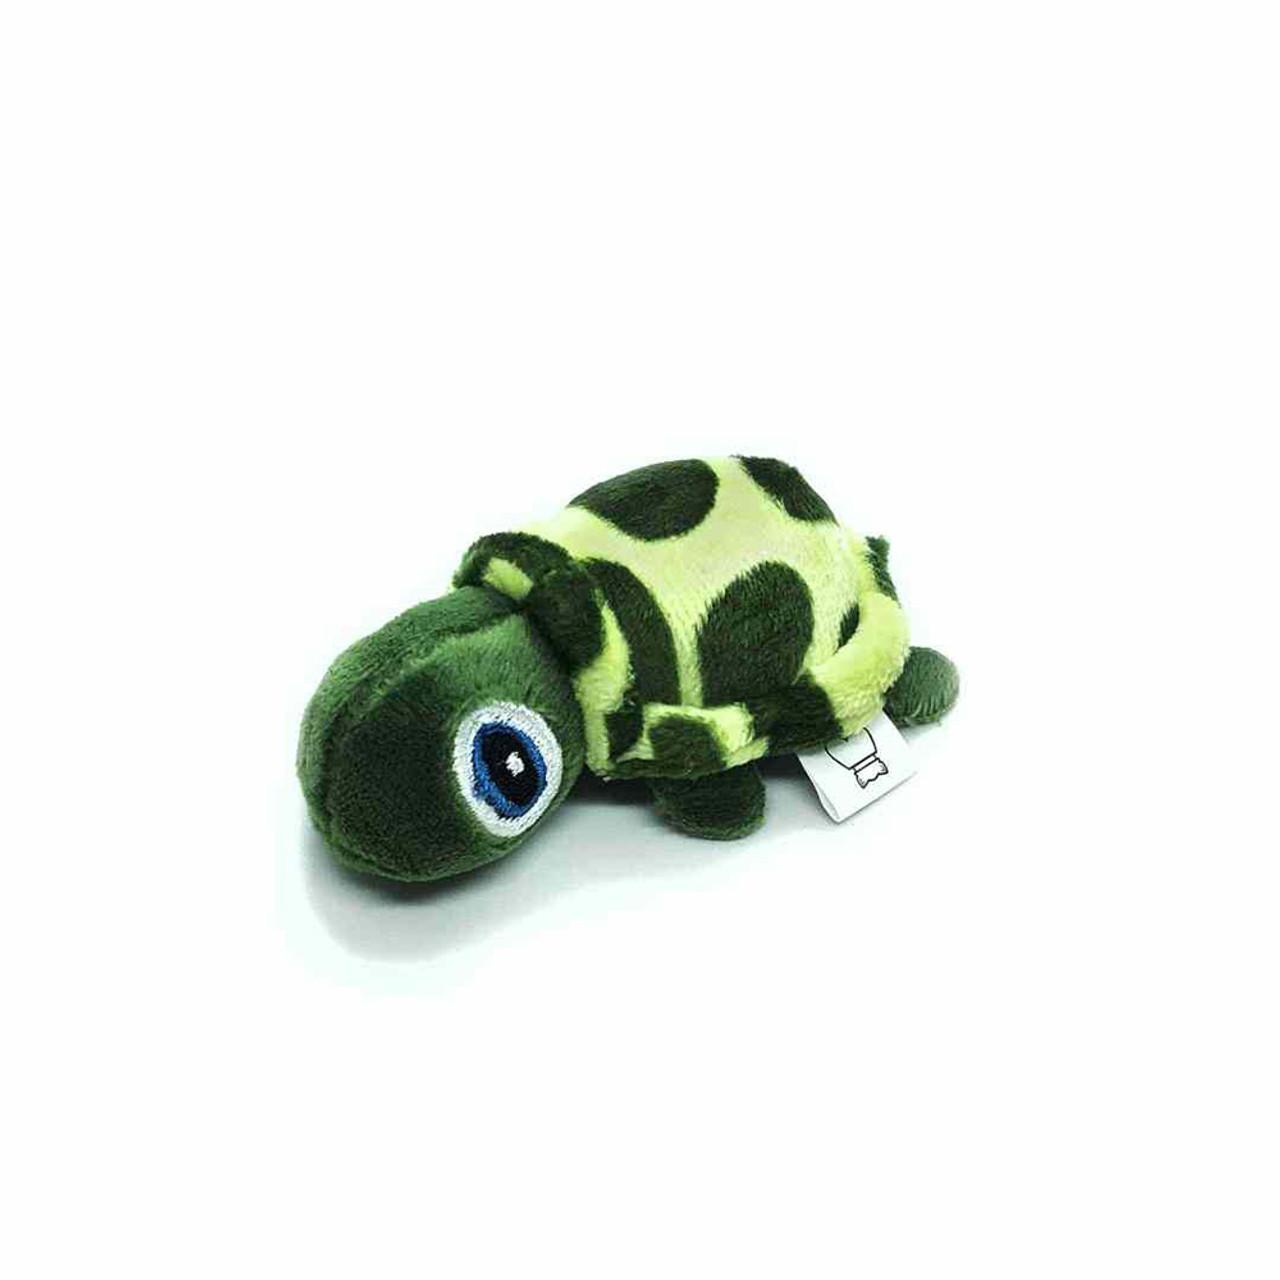 Doyen Sea Buddies Turtle Catnip Plush Cat Toy